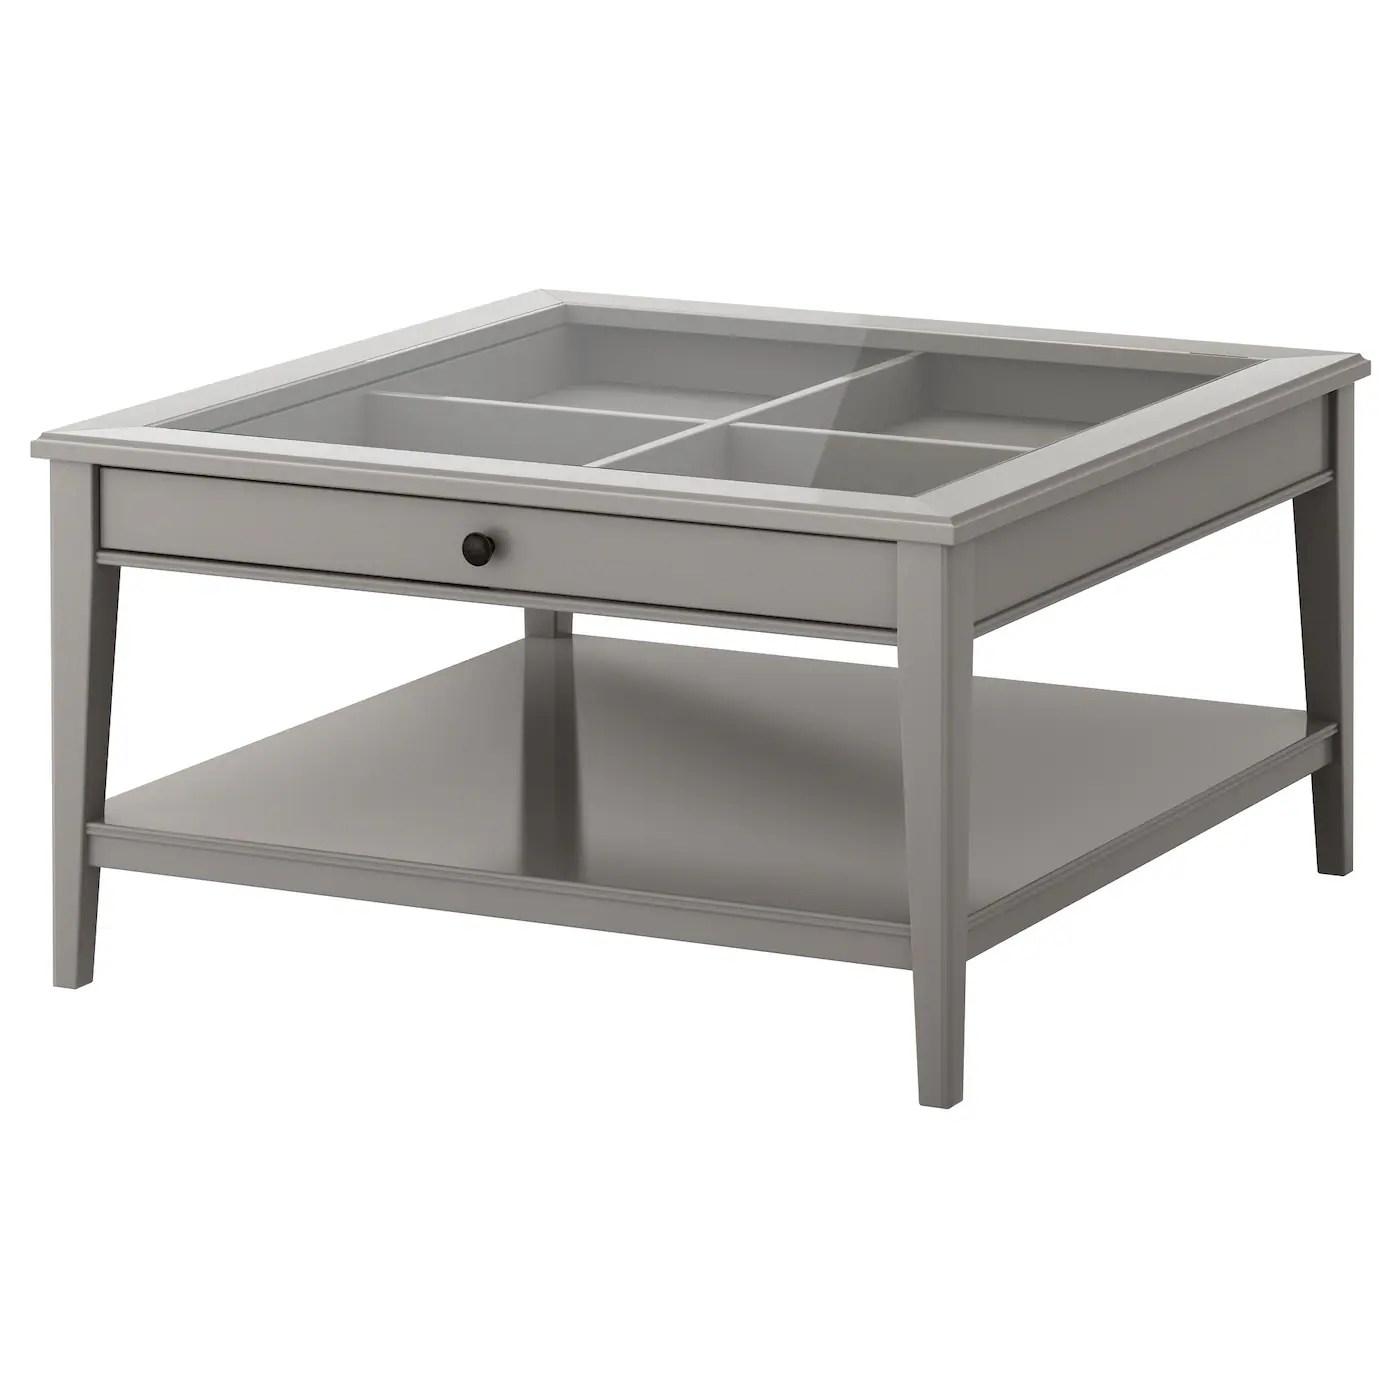 liatorp coffee table grey glass 93x93 cm